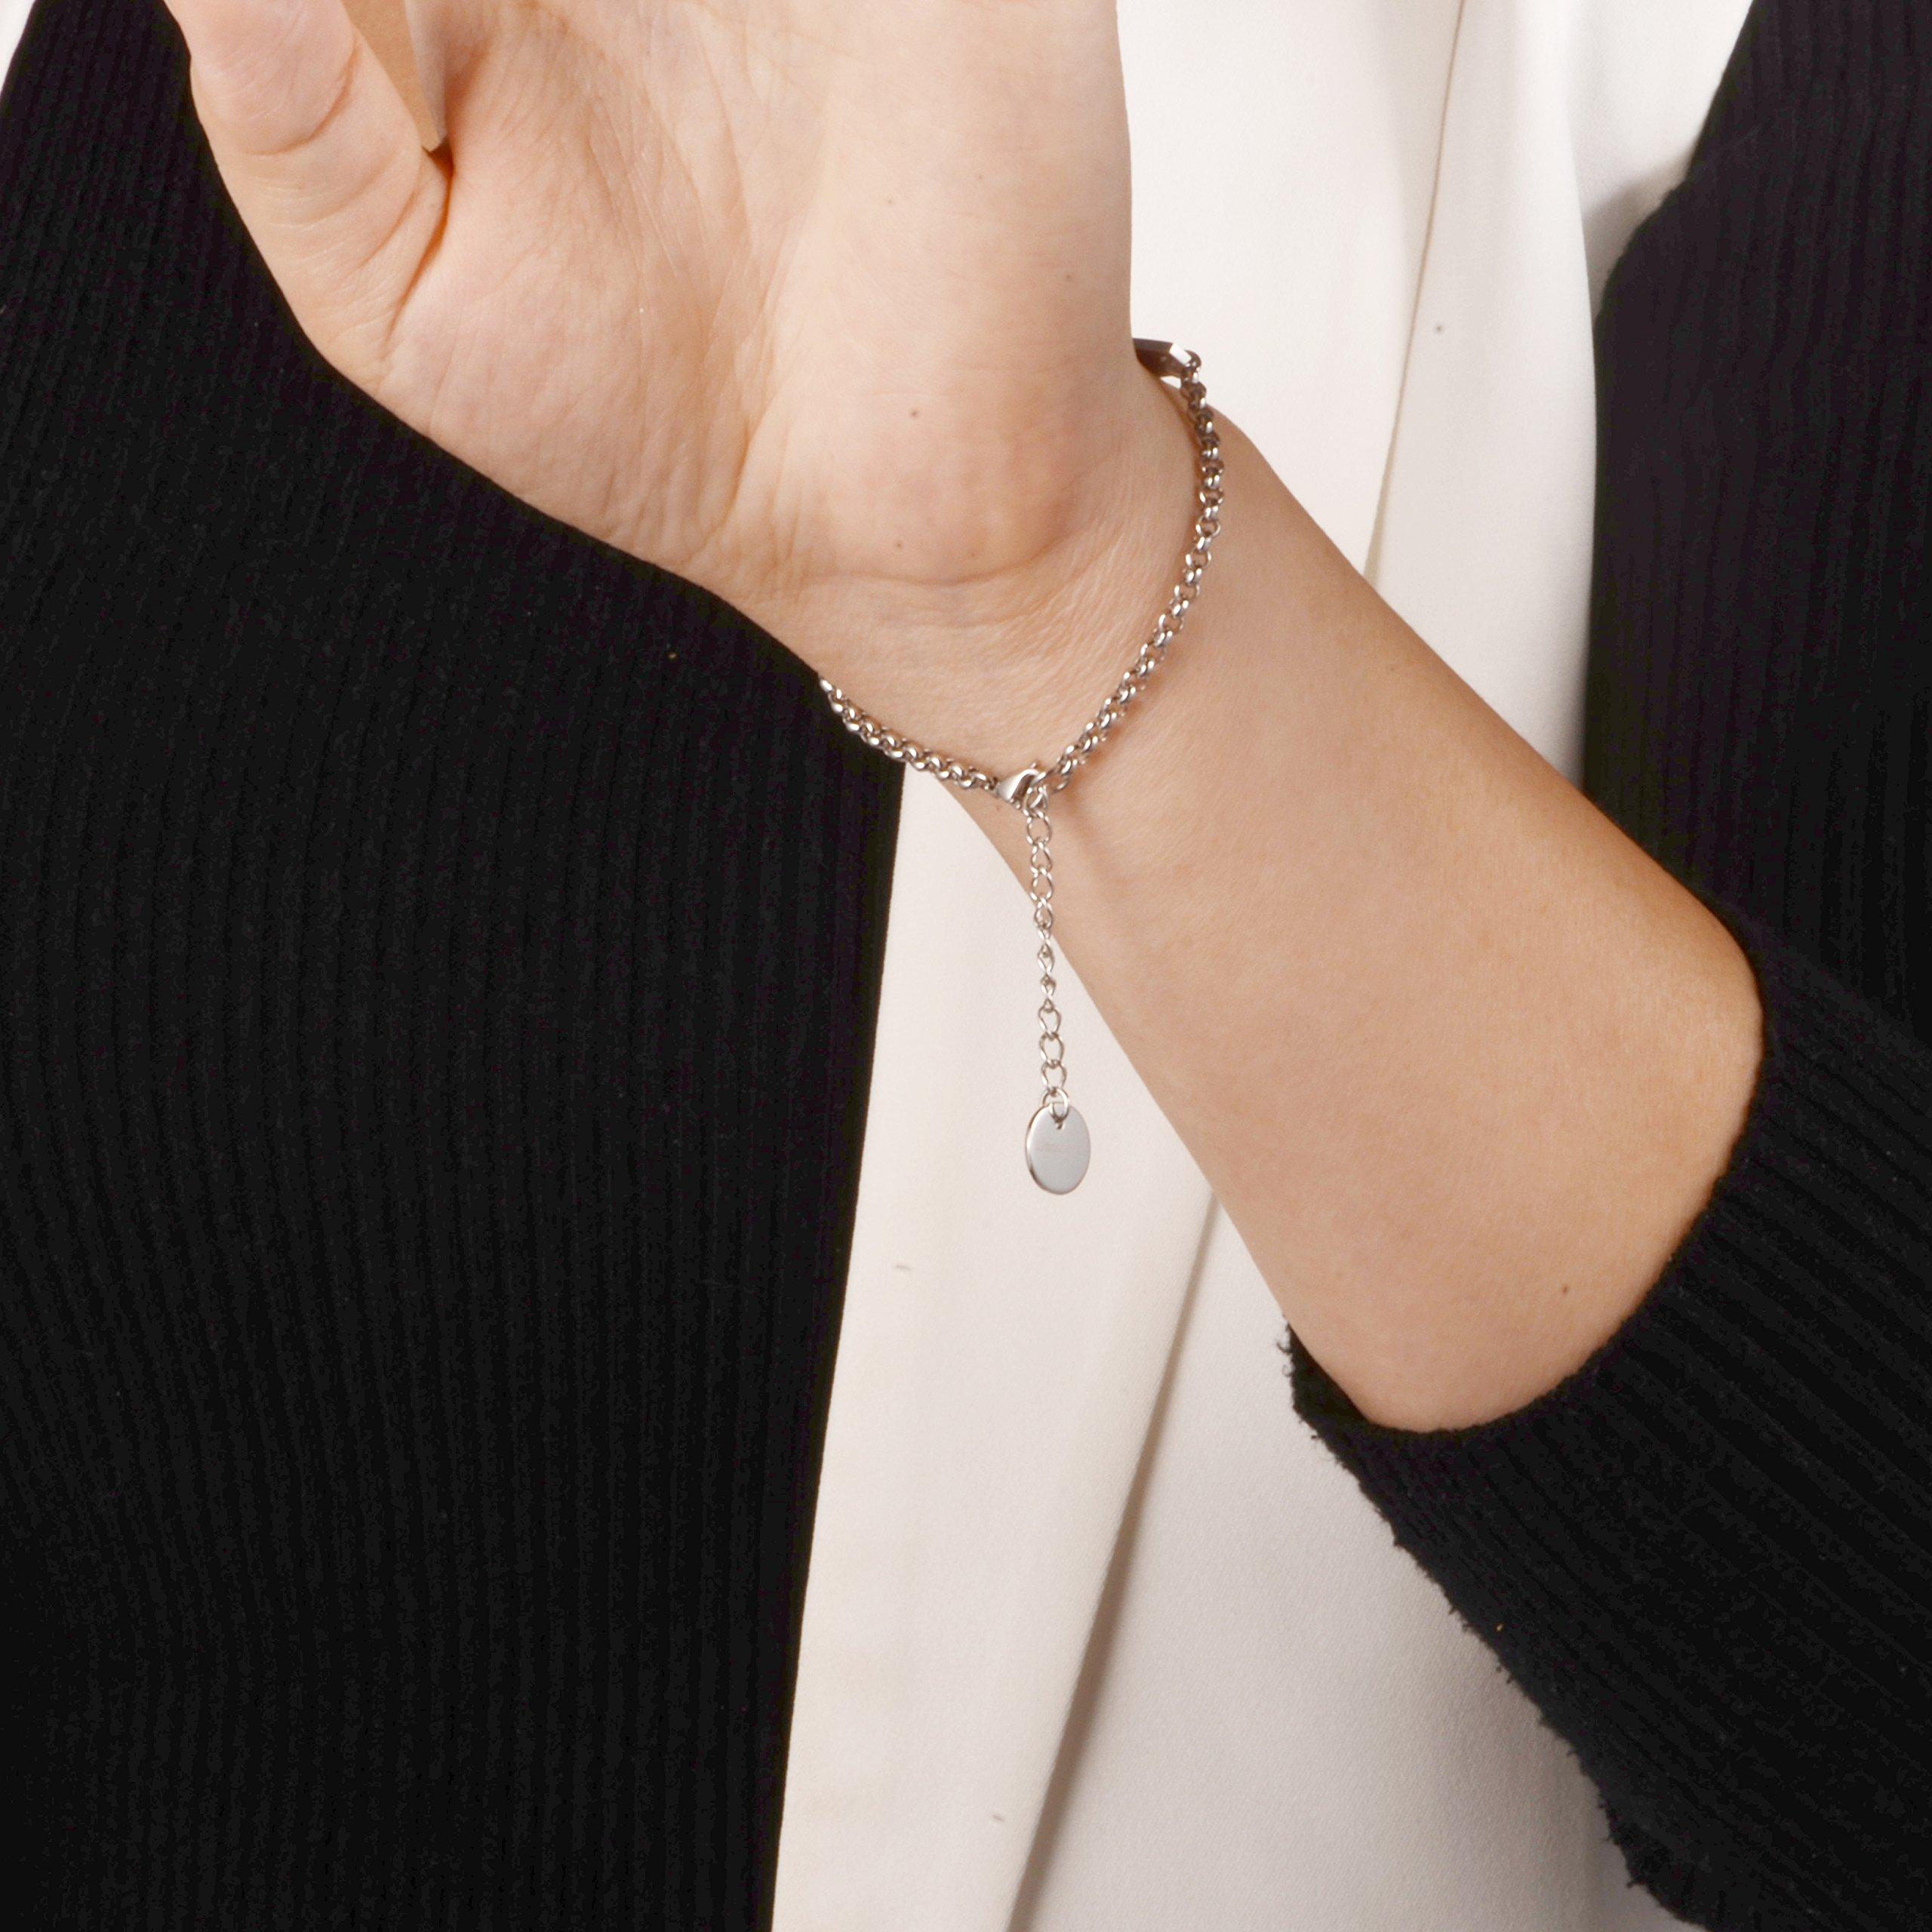 linnalove-Pre-Engraved Diabetes Type 2 Gold Simple Rolo Chain Medical Bracelet for Women & Girl by linnalove (Image #3)